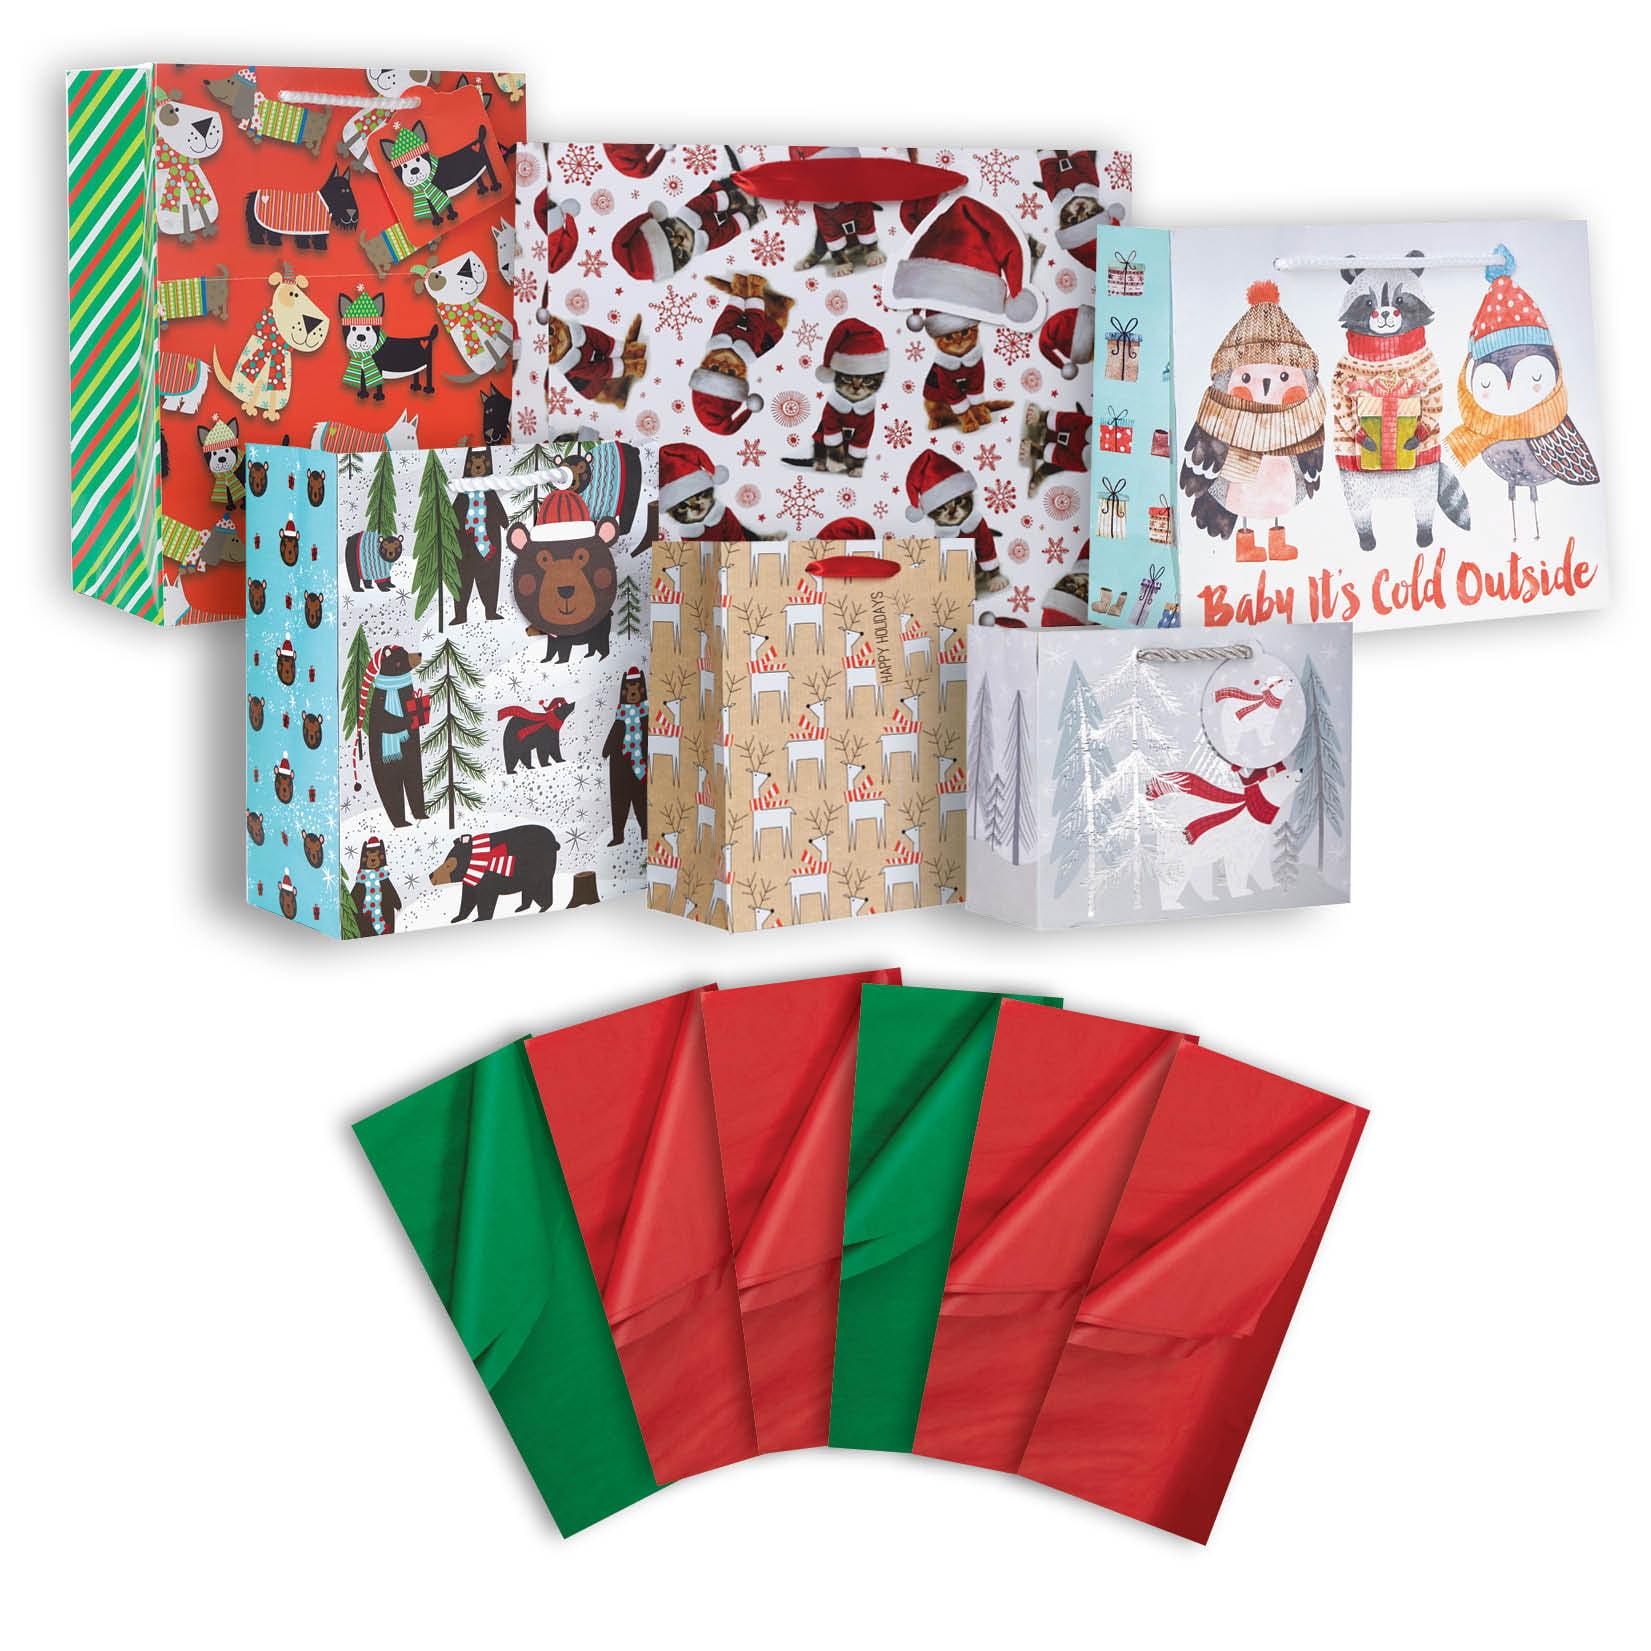 Jillson & Roberts Gift Bag & Tissue Assortment, Christmas Designs (6 Bags)